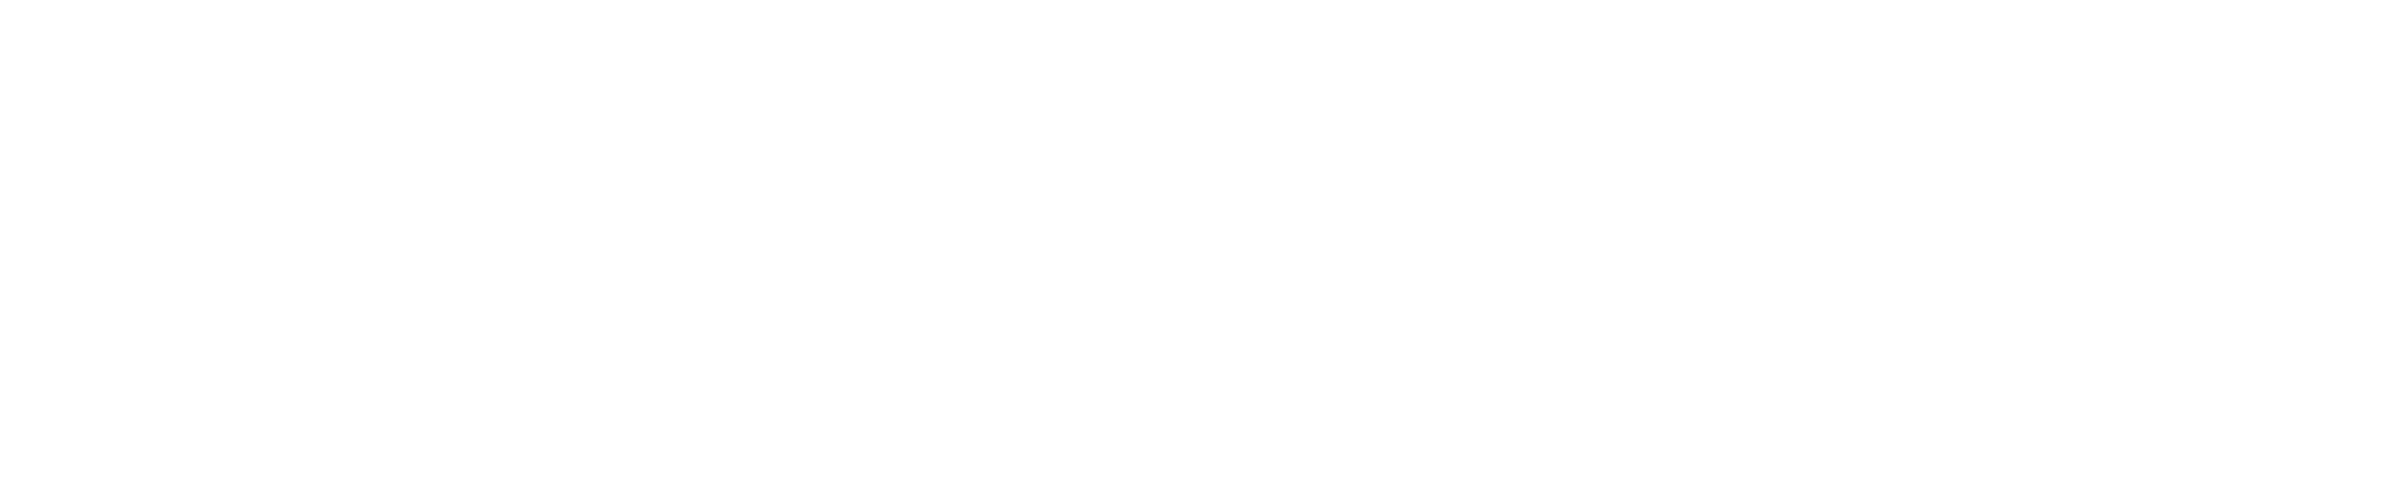 Embody your awakening Banner (2)